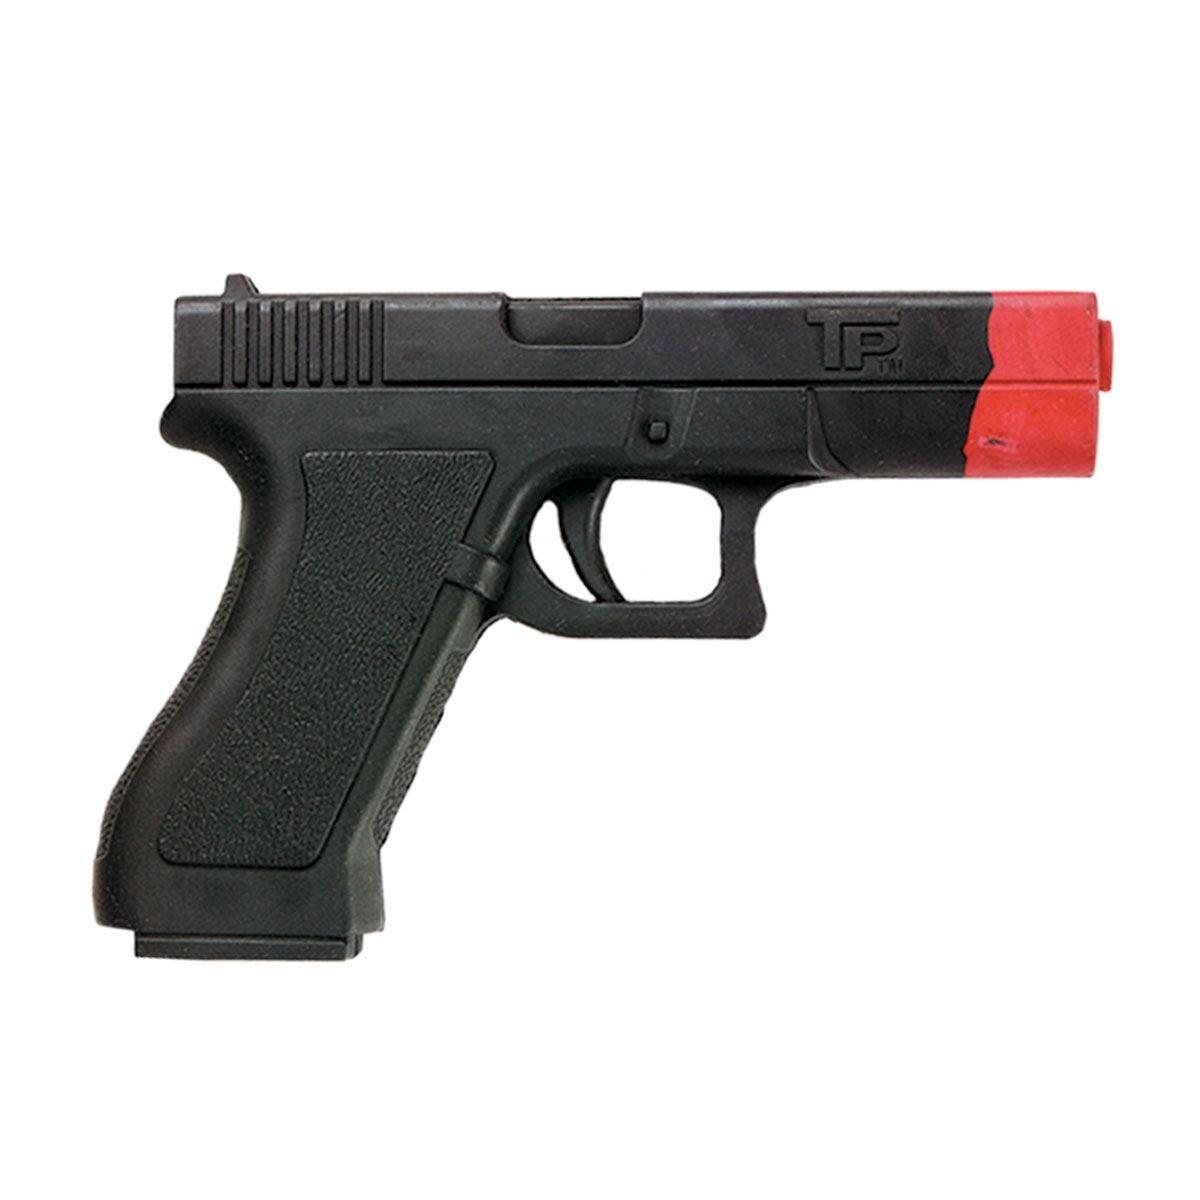 TP Hardware Rubber Hand Gun